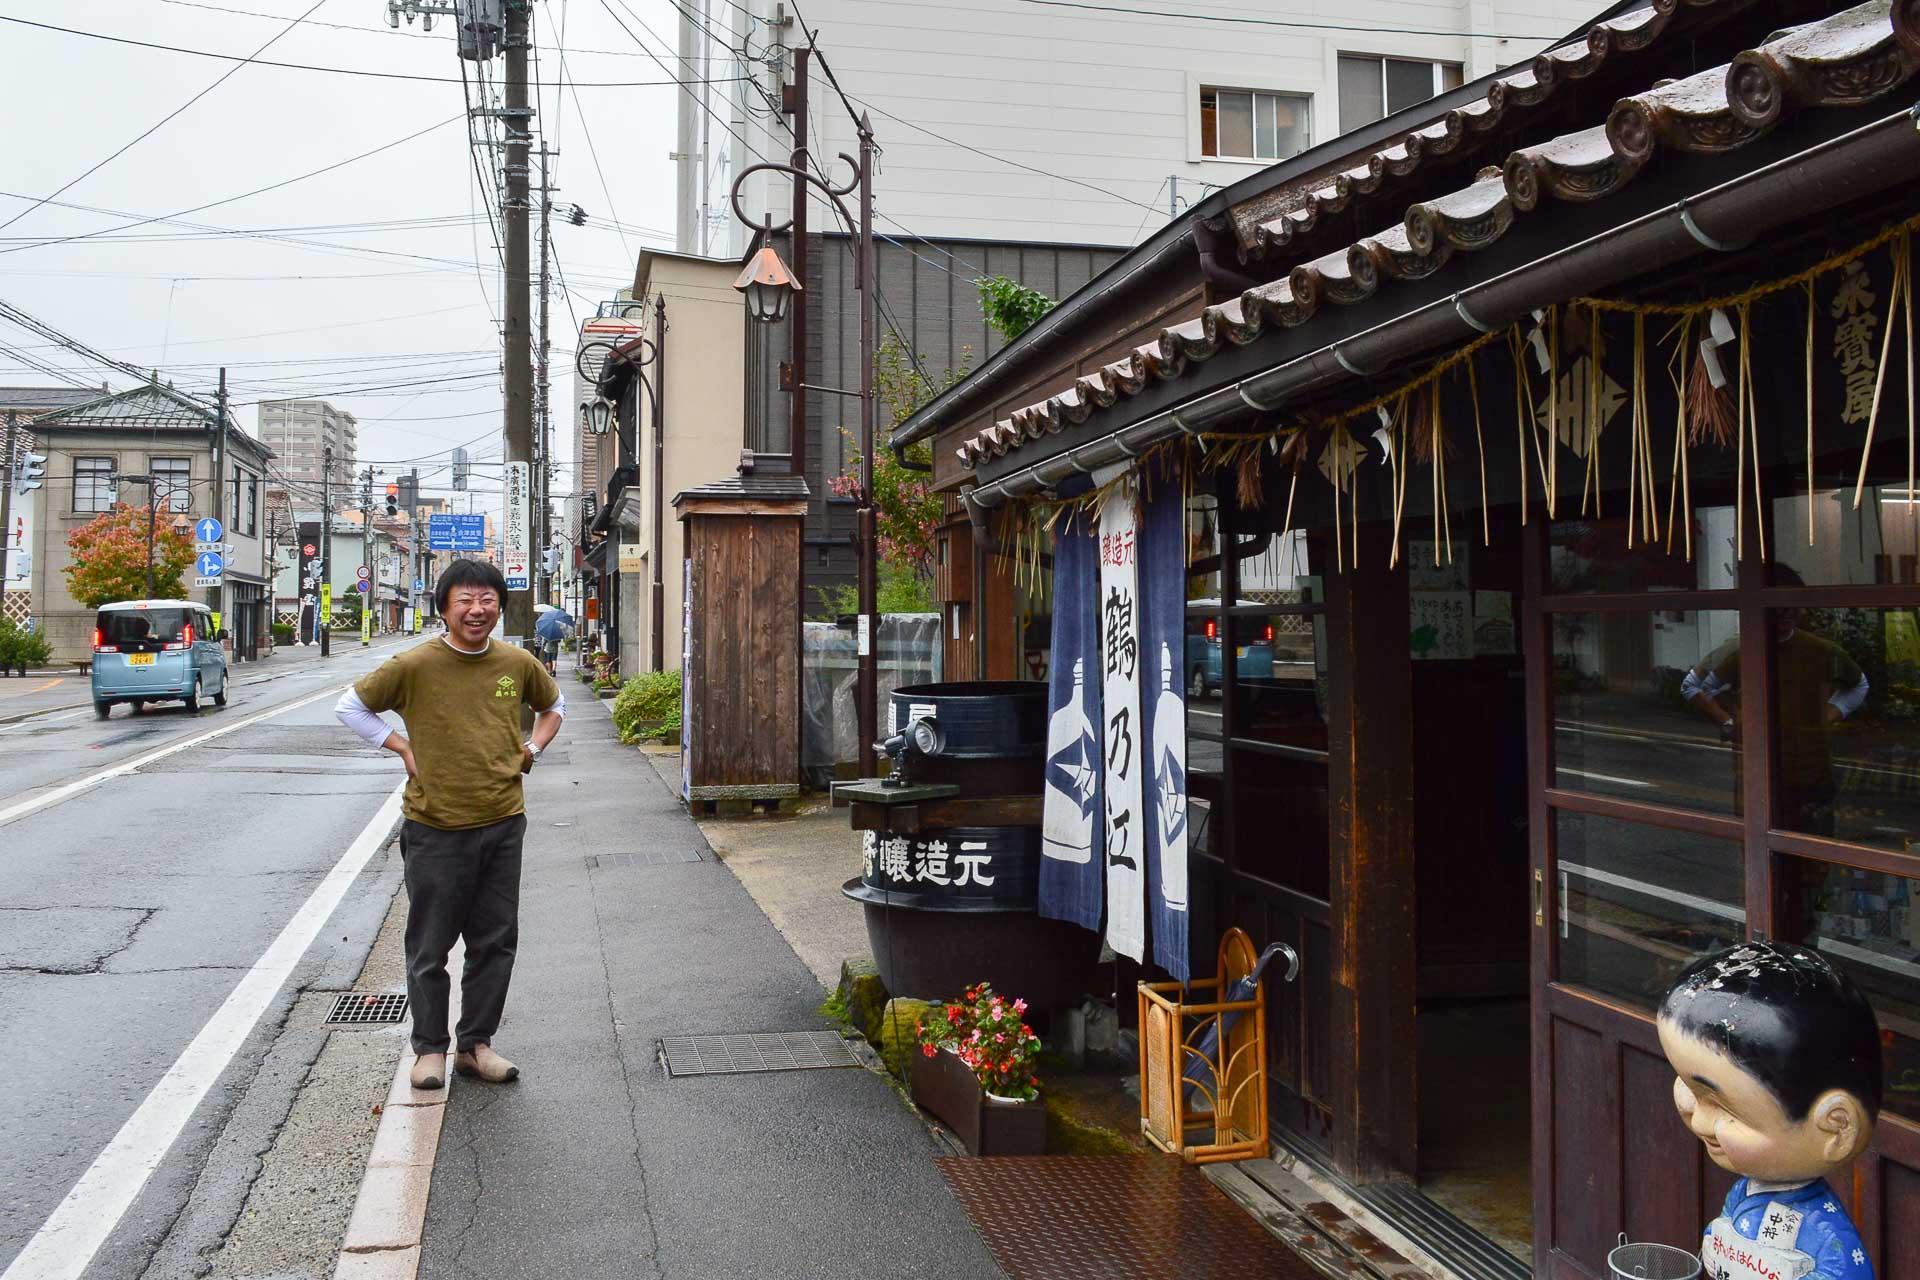 Monsieur Mukaï, brasseur de saké, devant le magasin Tsurunoe Shuzo.